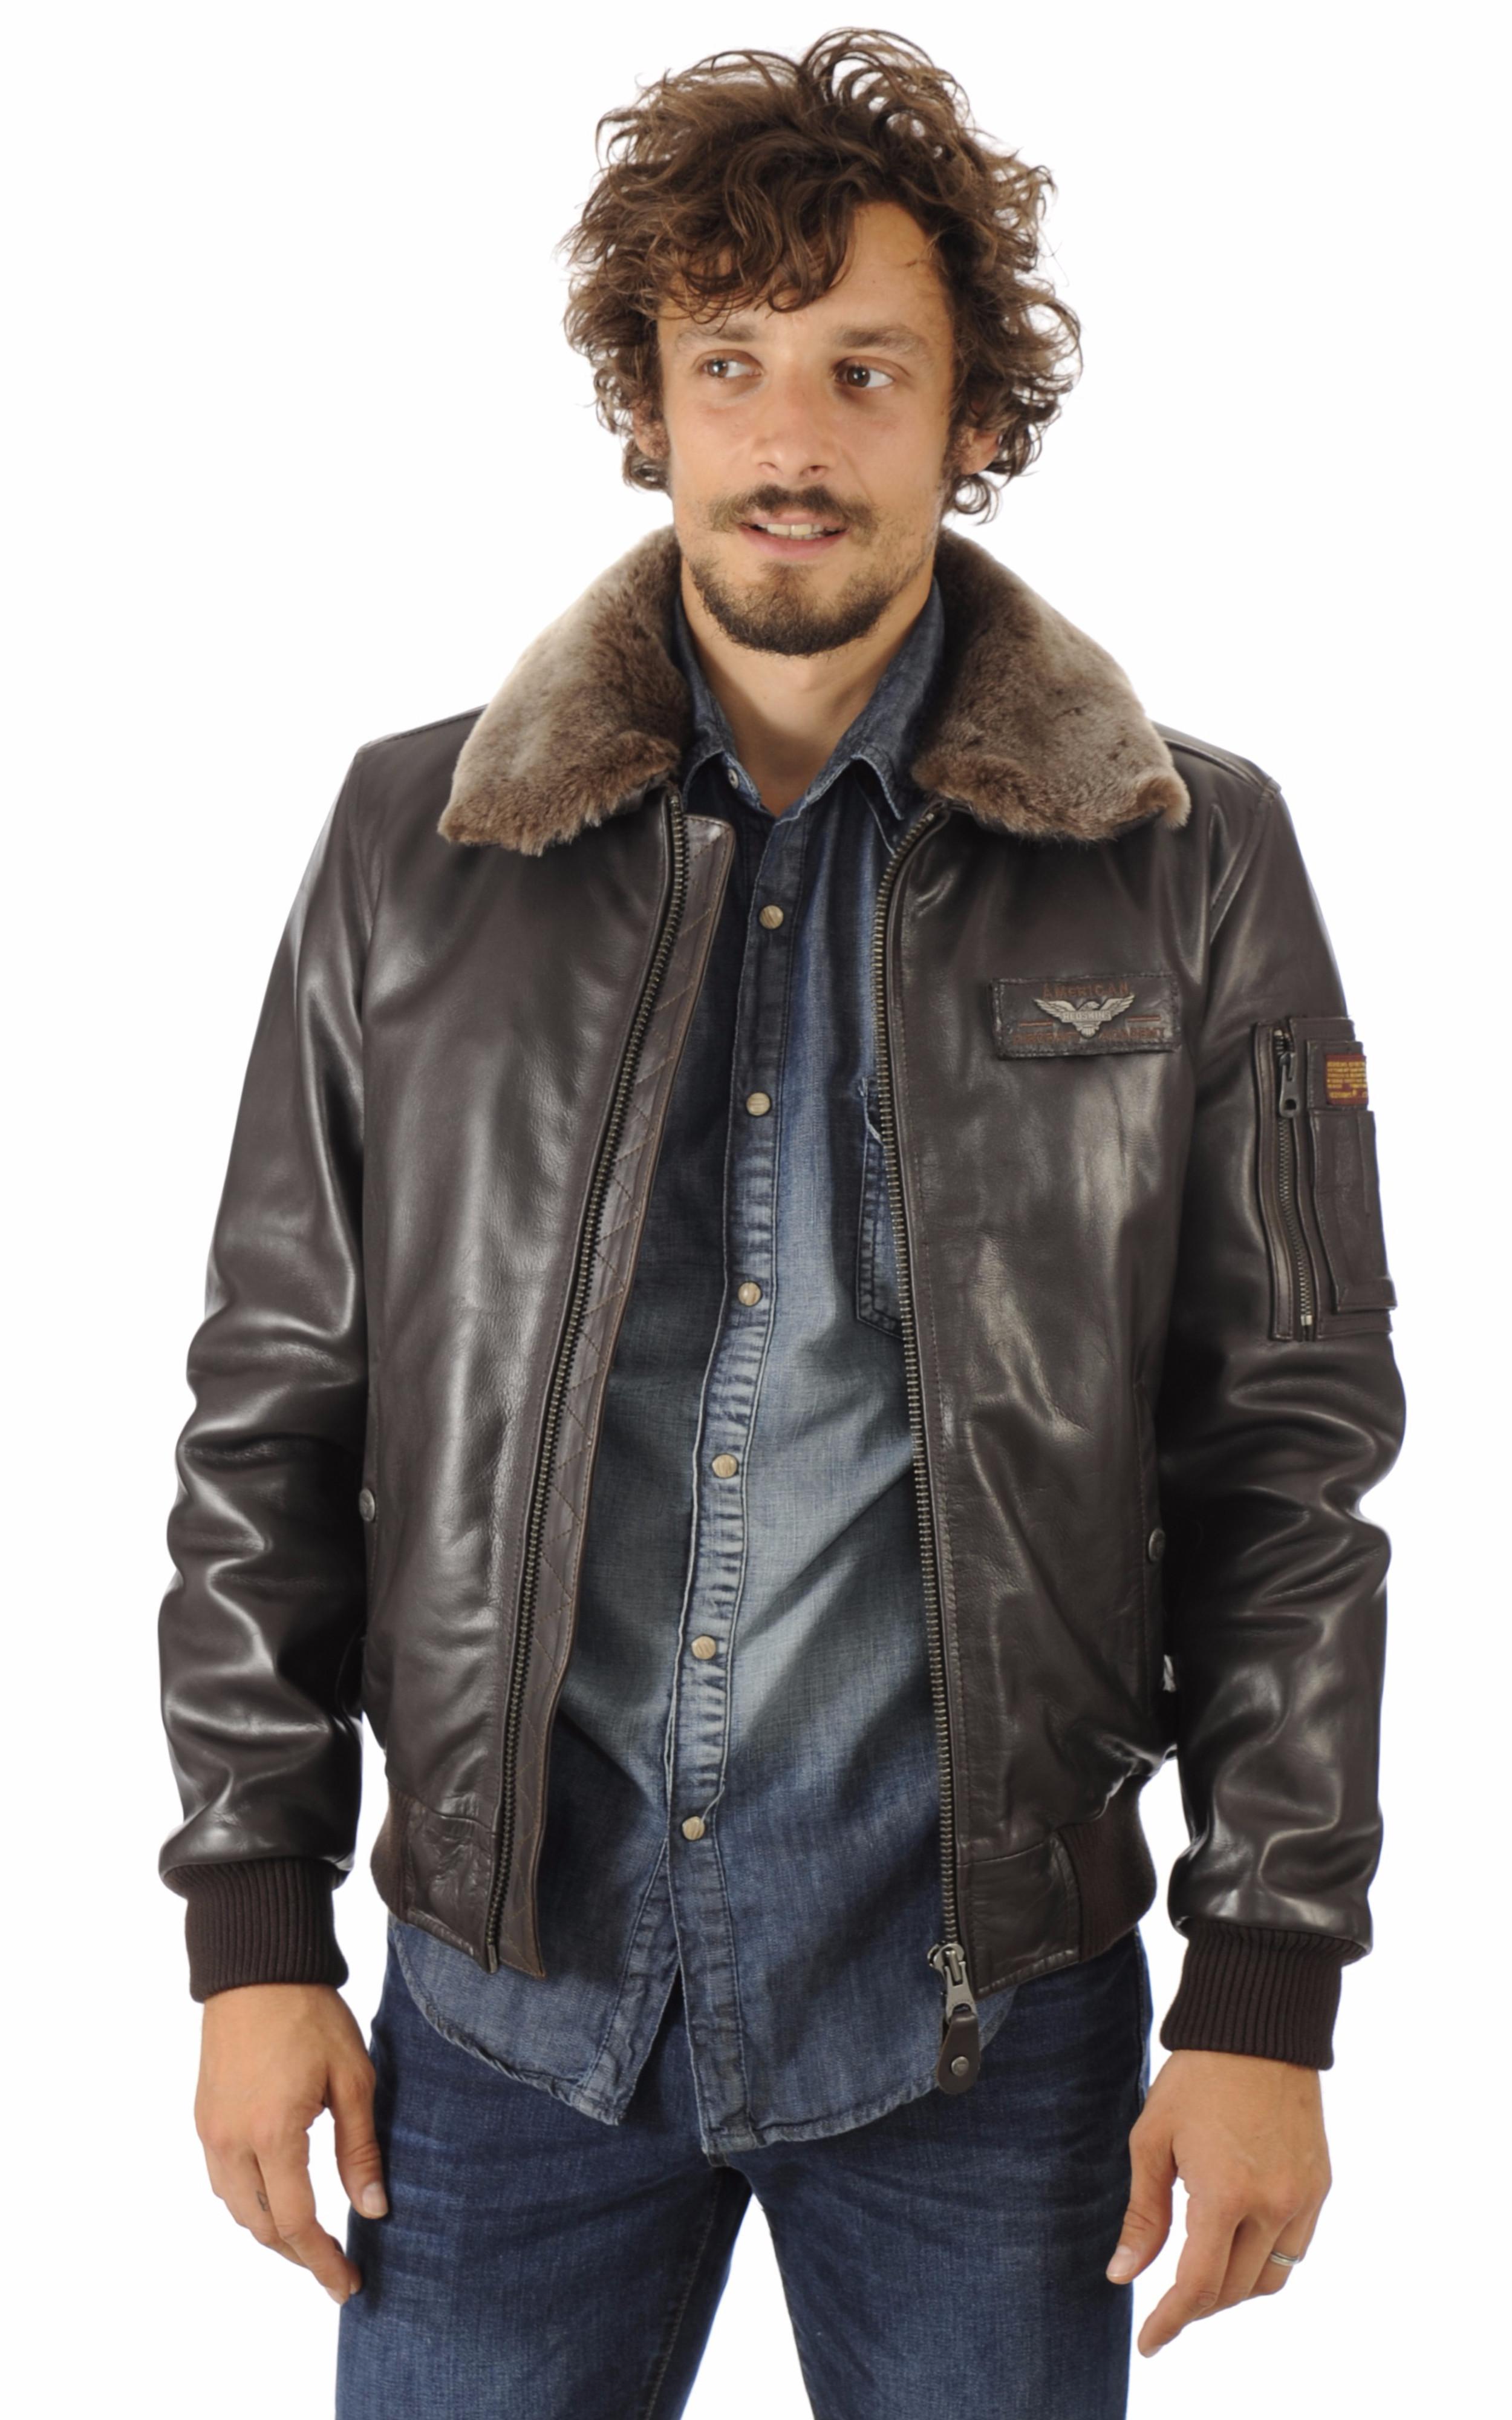 blouson texaco cuir aviateur marron redskins la canadienne blouson cuir marron. Black Bedroom Furniture Sets. Home Design Ideas